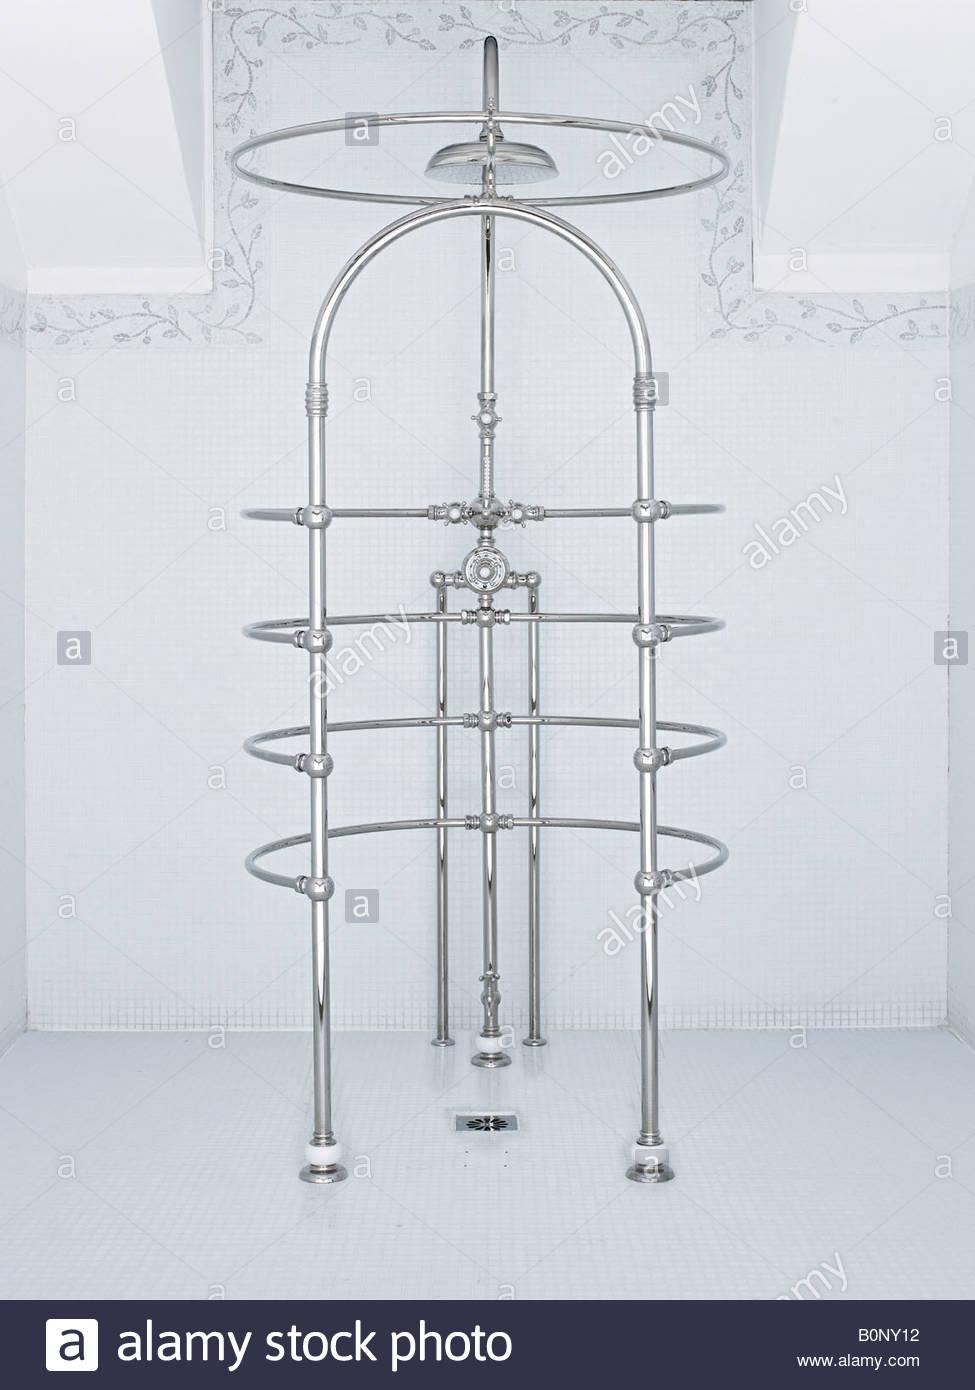 wrap around shower Stock Photo, Royalty Free Image: 17692558 - Alamy